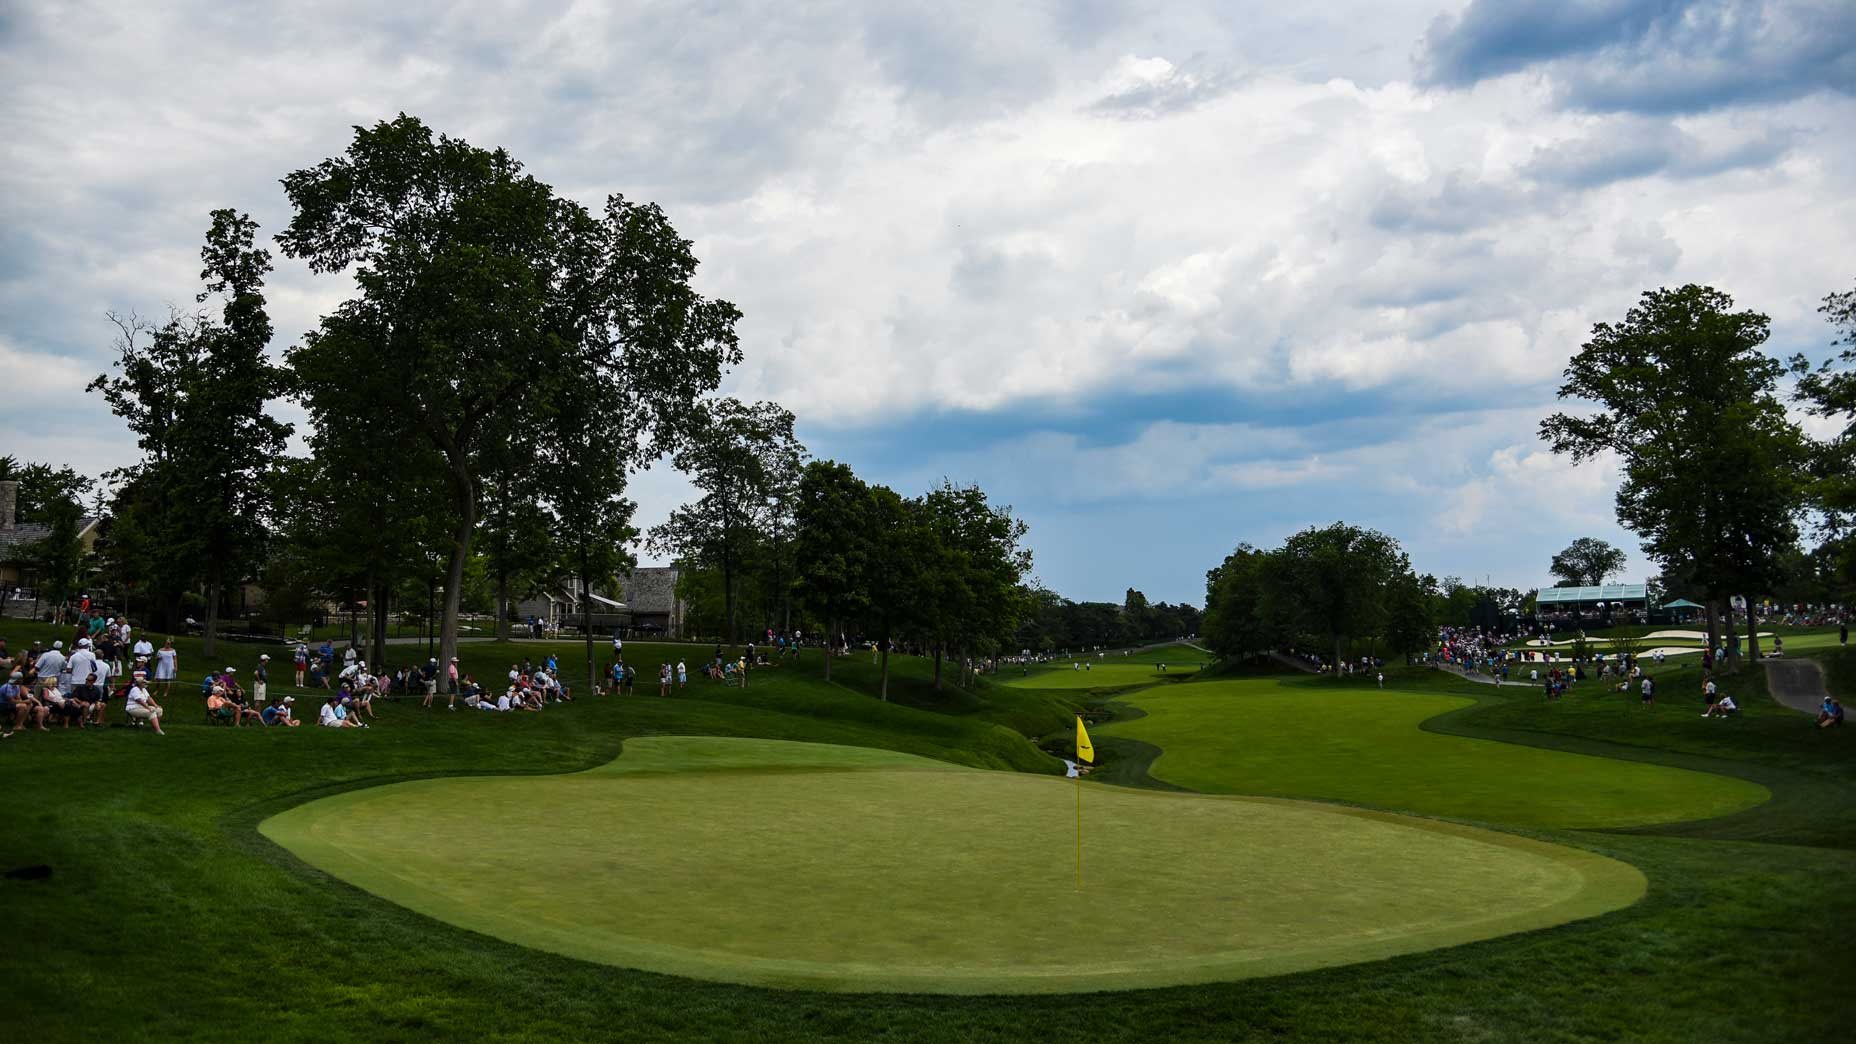 The par-5 11th hole at Muirfield Village Golf Club in 2017.